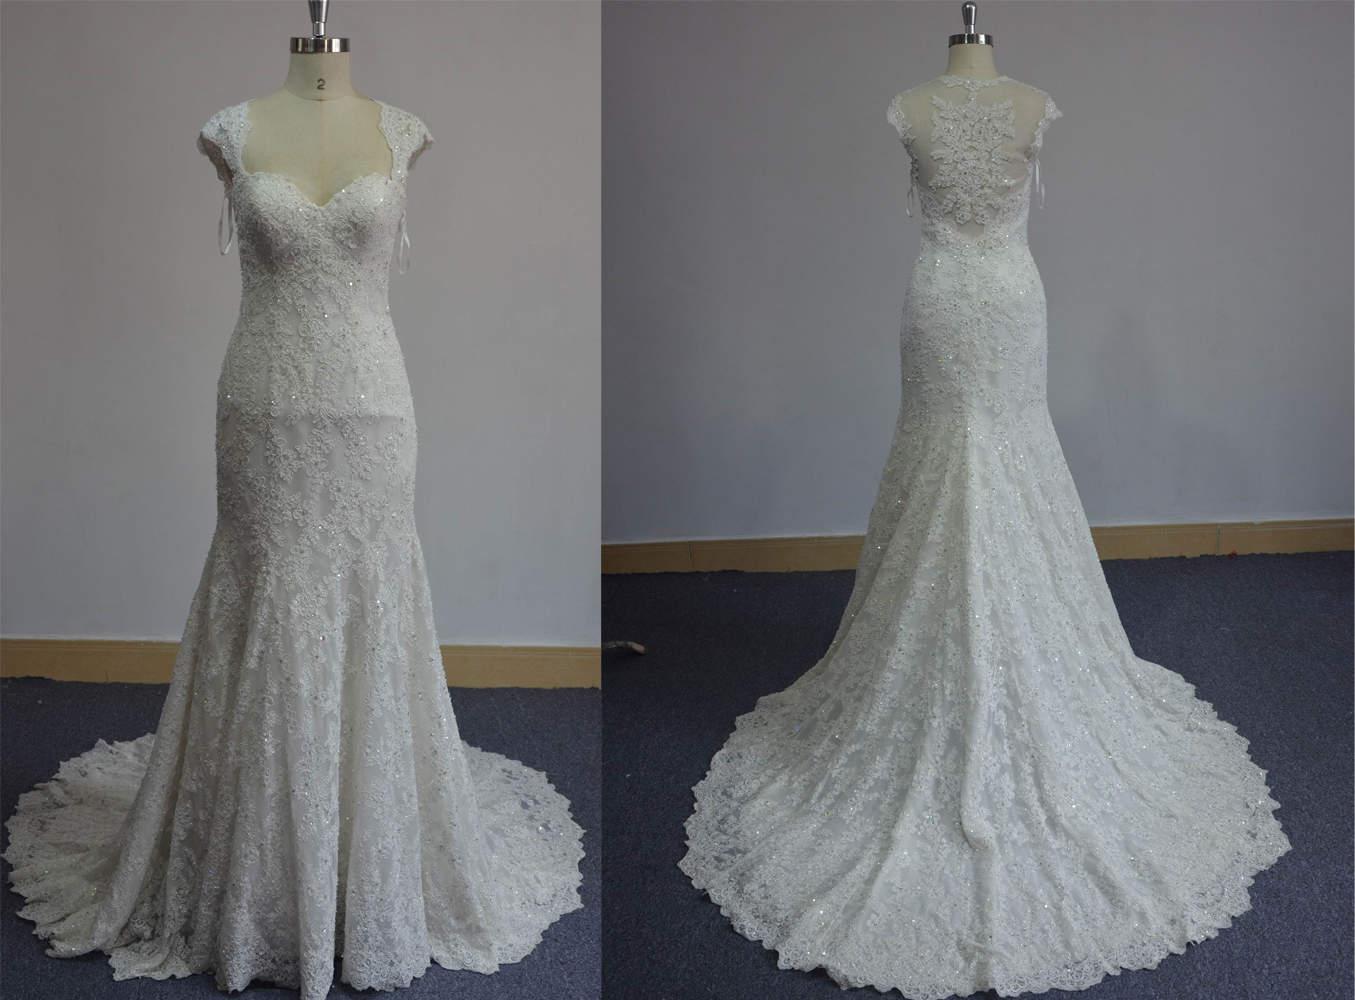 Beaded stretch lace wedding dresses darius cordell for Stretch lace wedding dress